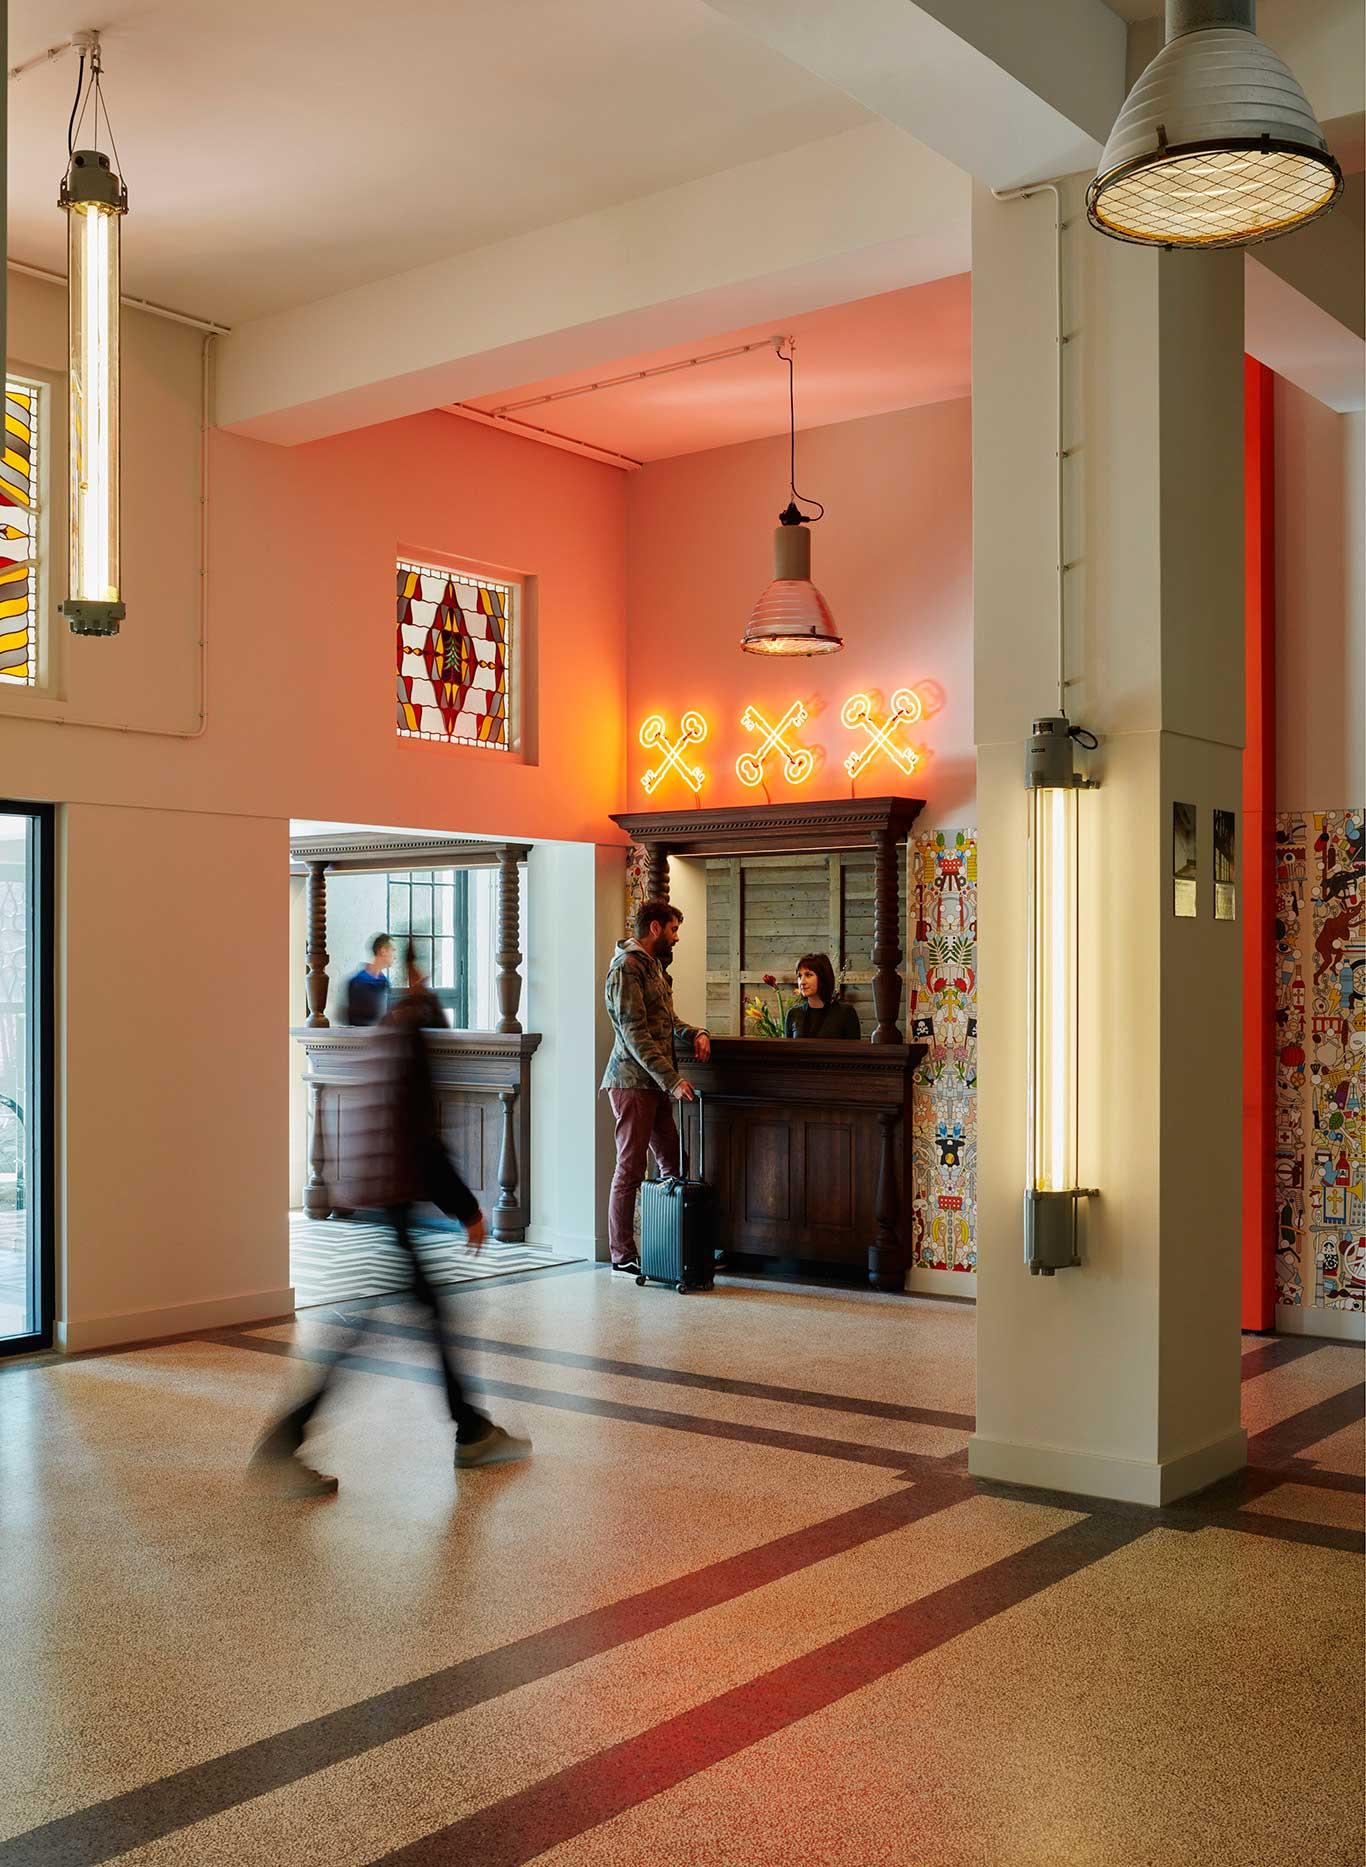 Hostel Generator-Amsterdam 02